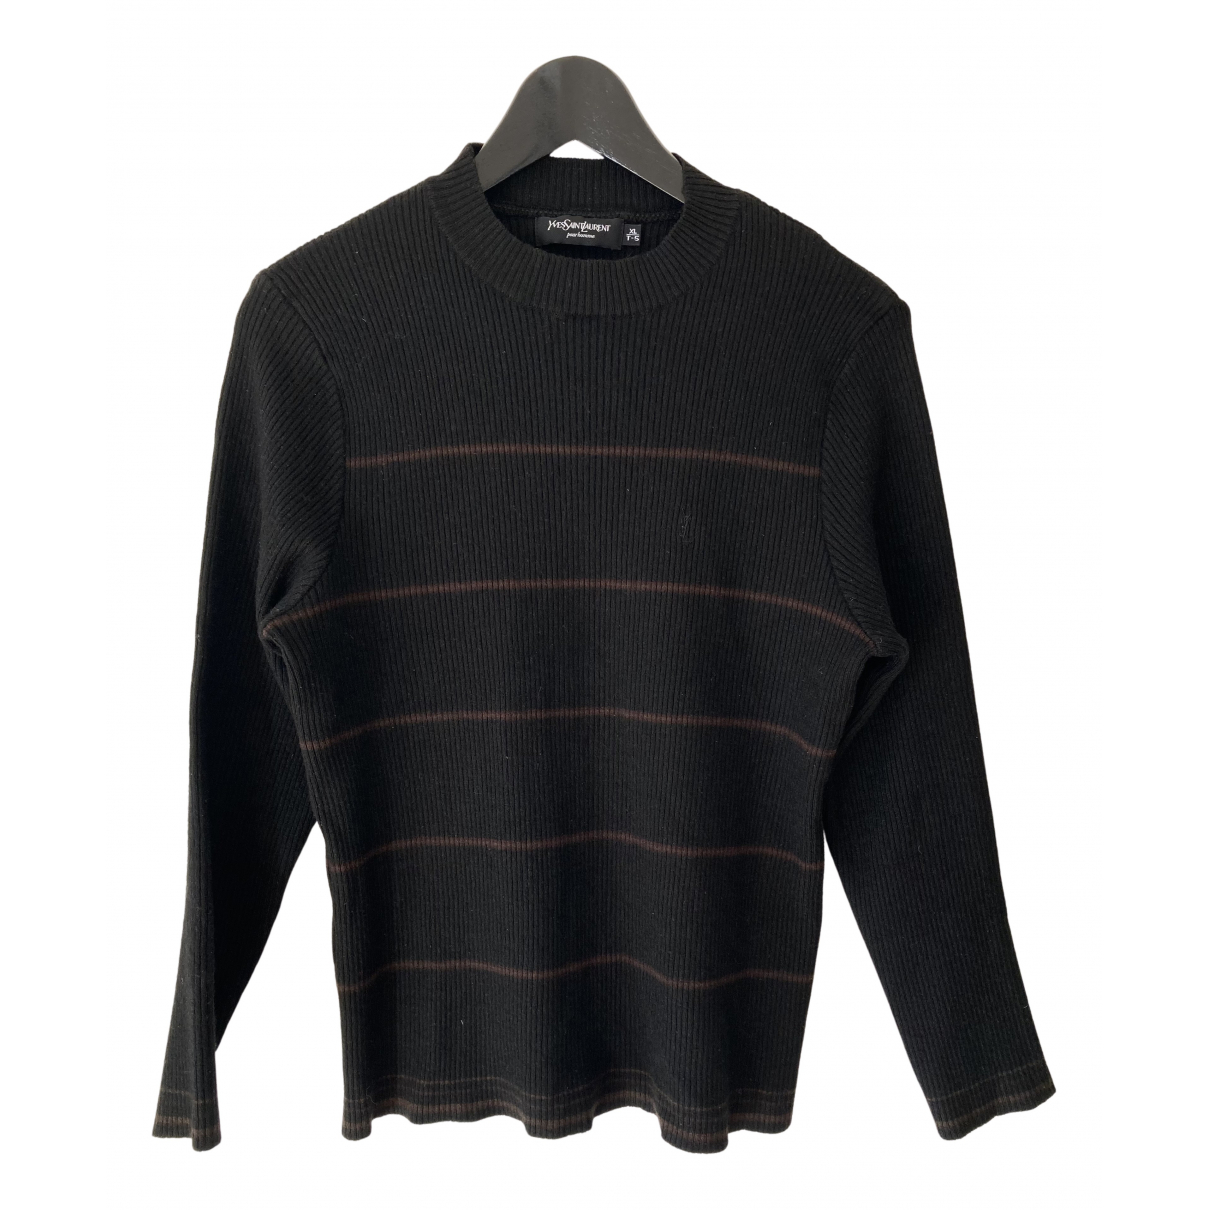 Yves Saint Laurent N Black Wool Knitwear for Women 34 FR